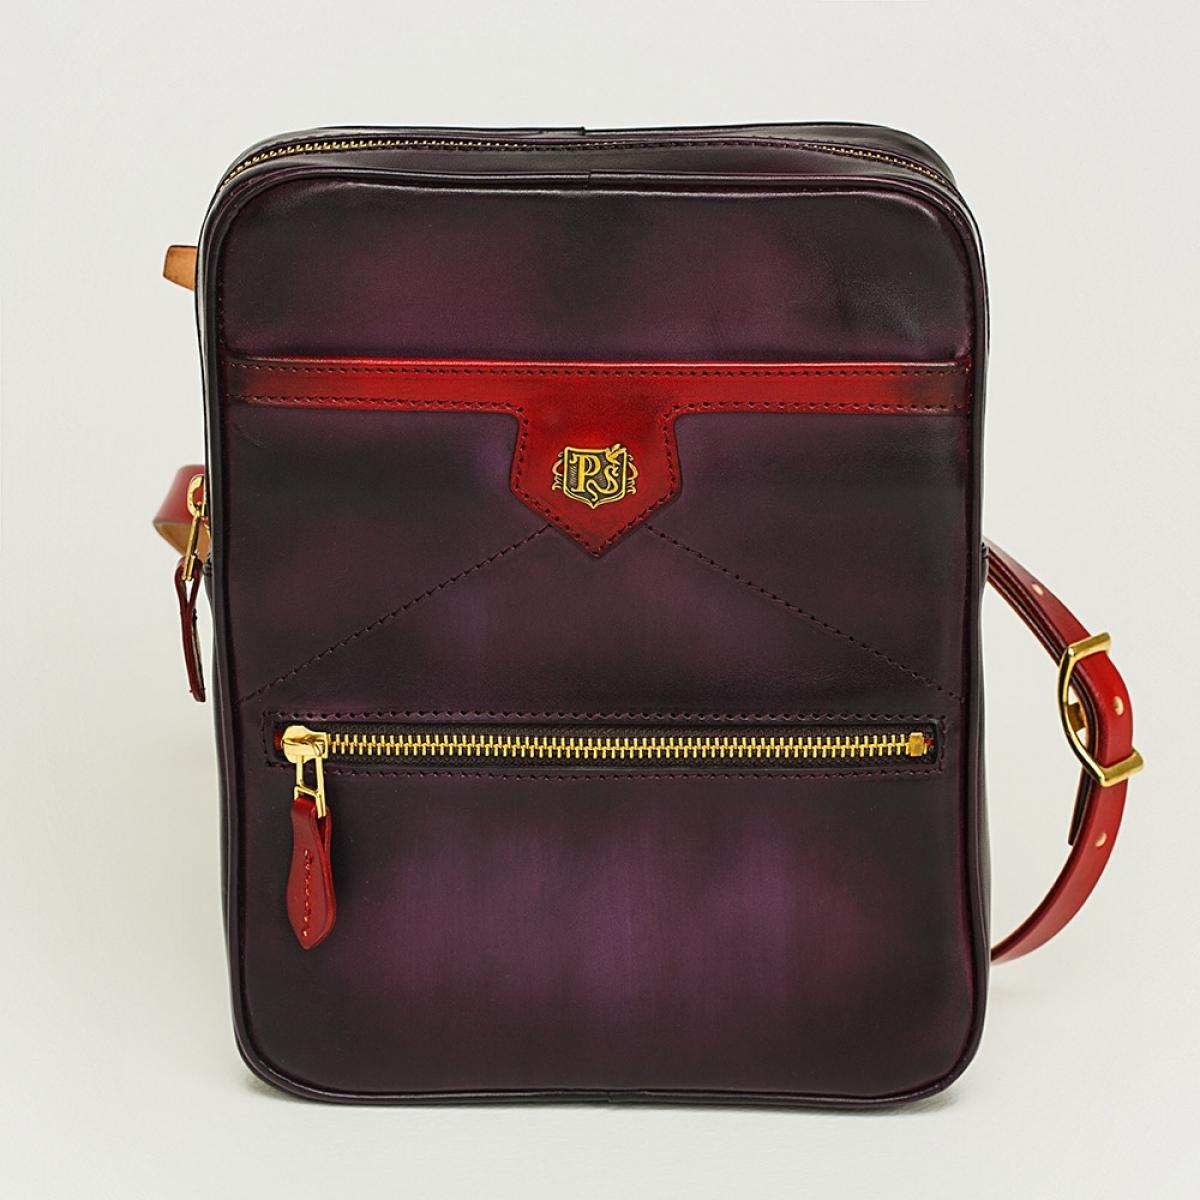 Crossbody bag MEZZO red currant & plum wine